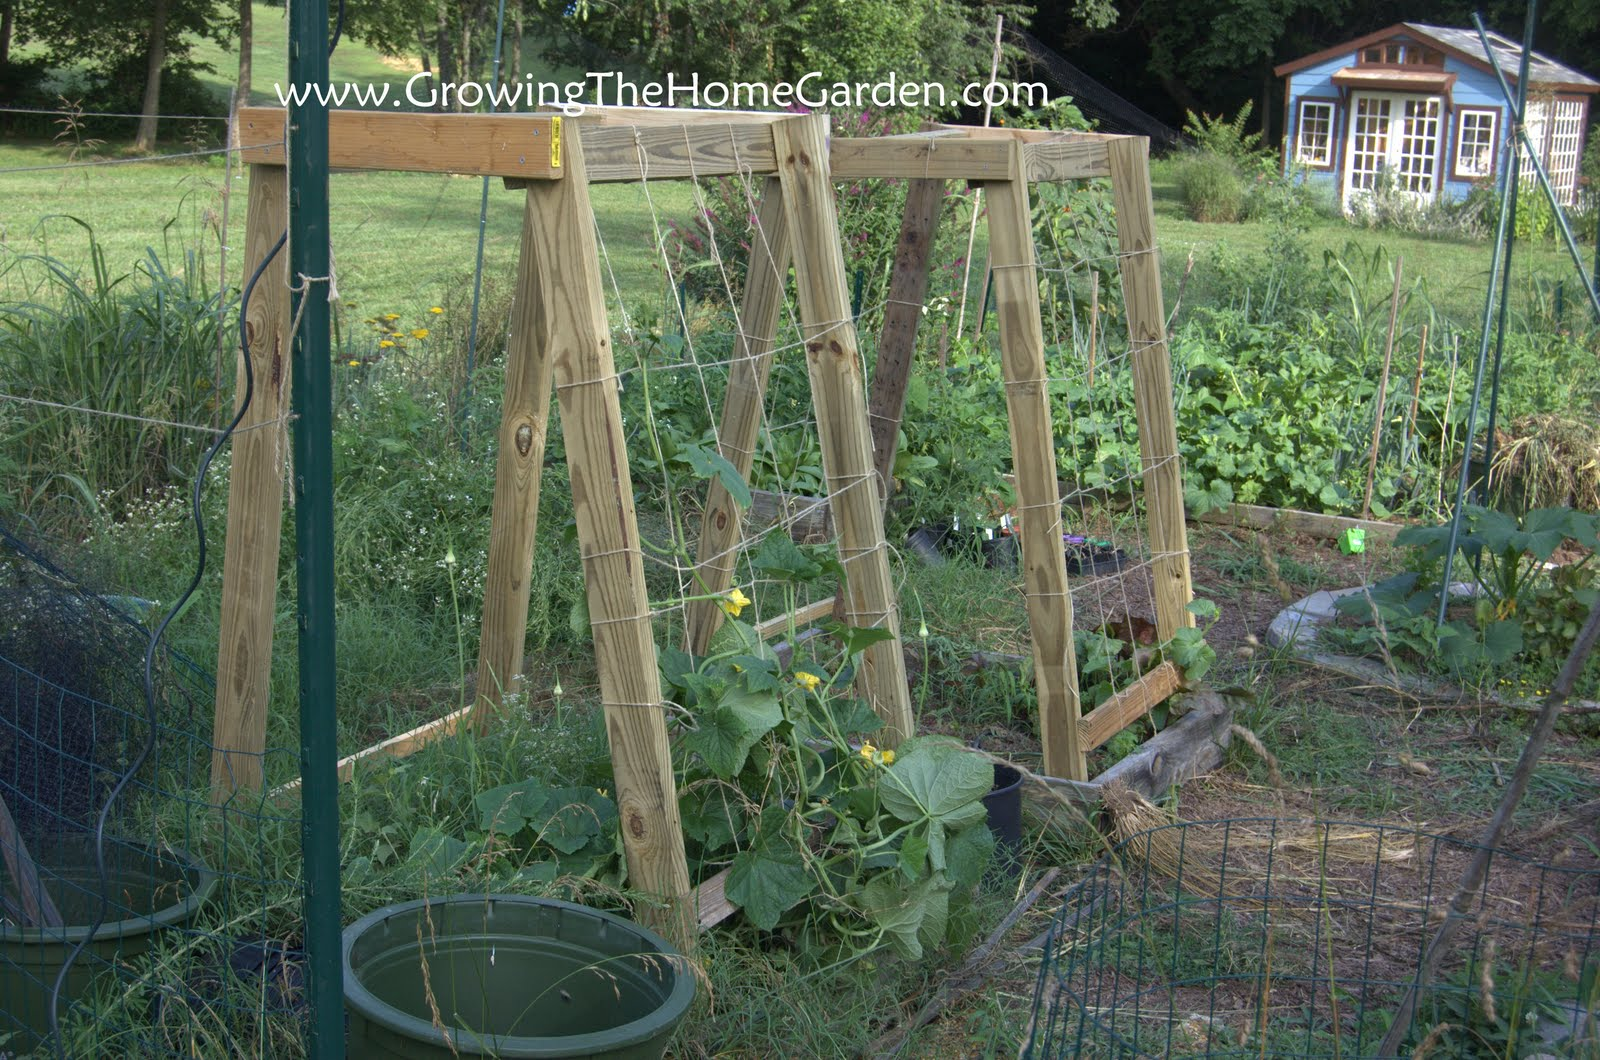 Homemade Cucumber Or Melon Trellises Growing The Home Garden